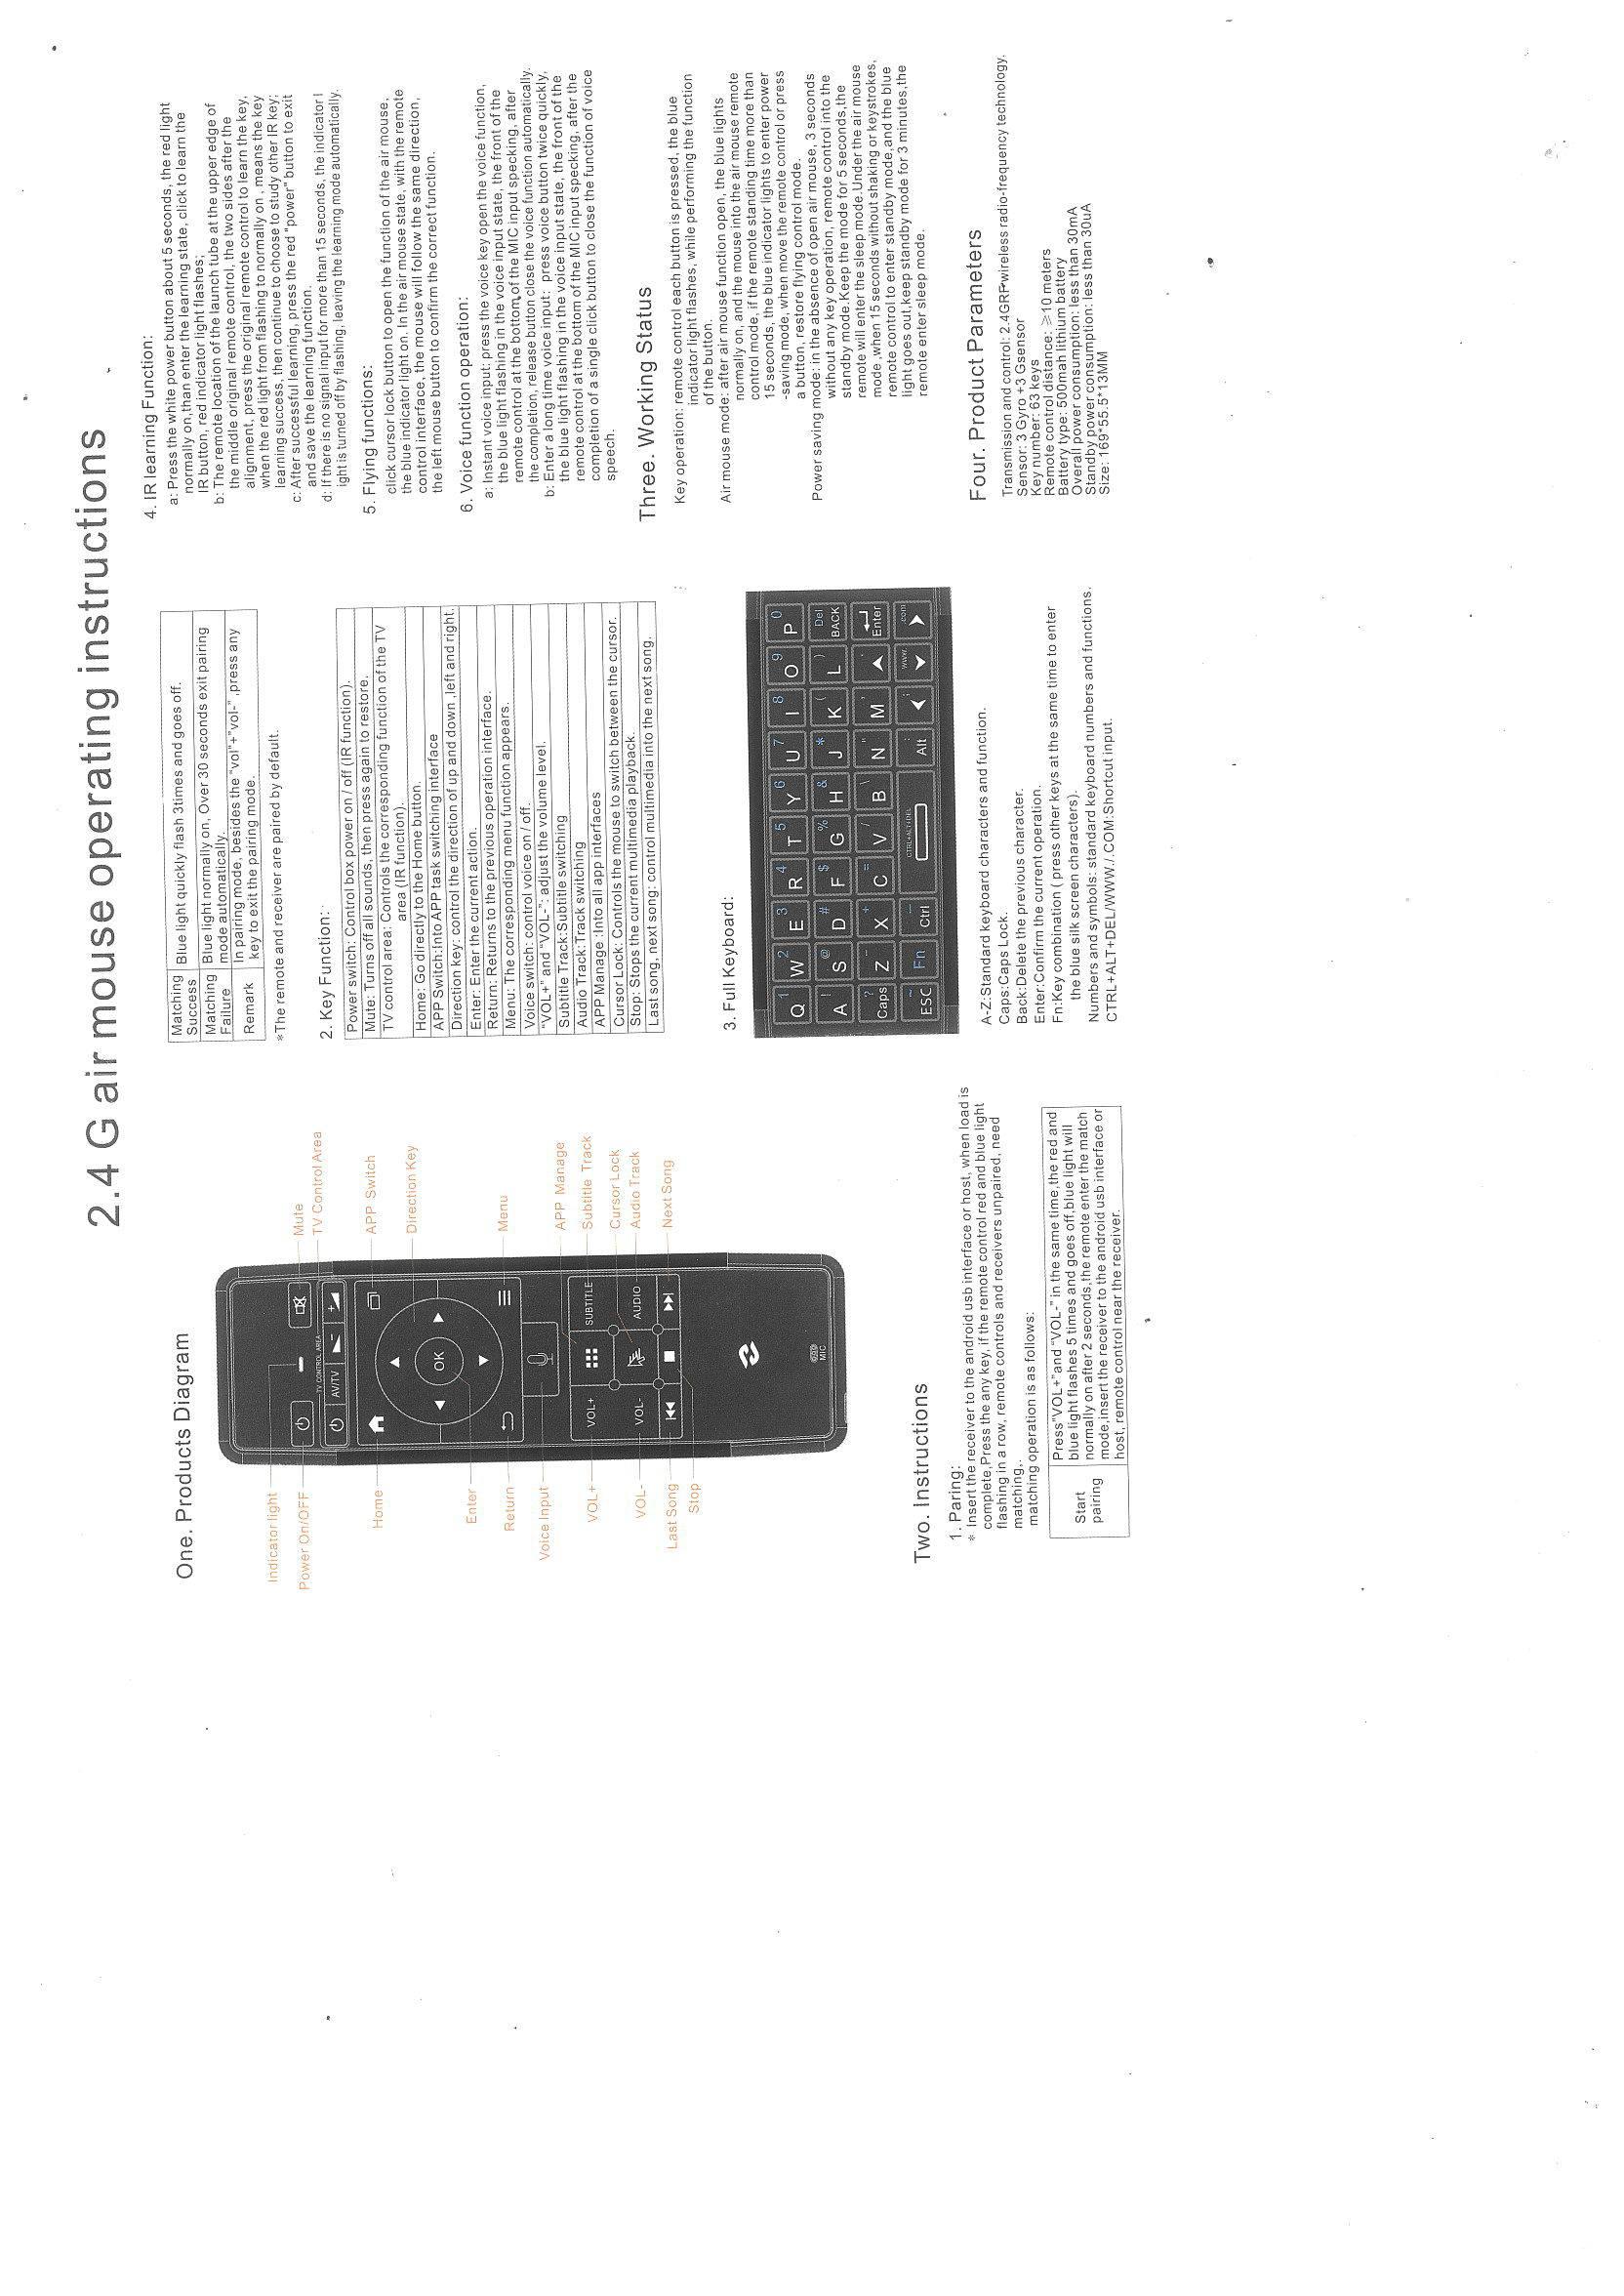 File Management Intel Puma 6 Block Diagram Cvadp A845 Manual Https Chinavasioncom China Wholesale Computer Accessories Mouse Keyboard Zidoo V5 Wireless Air